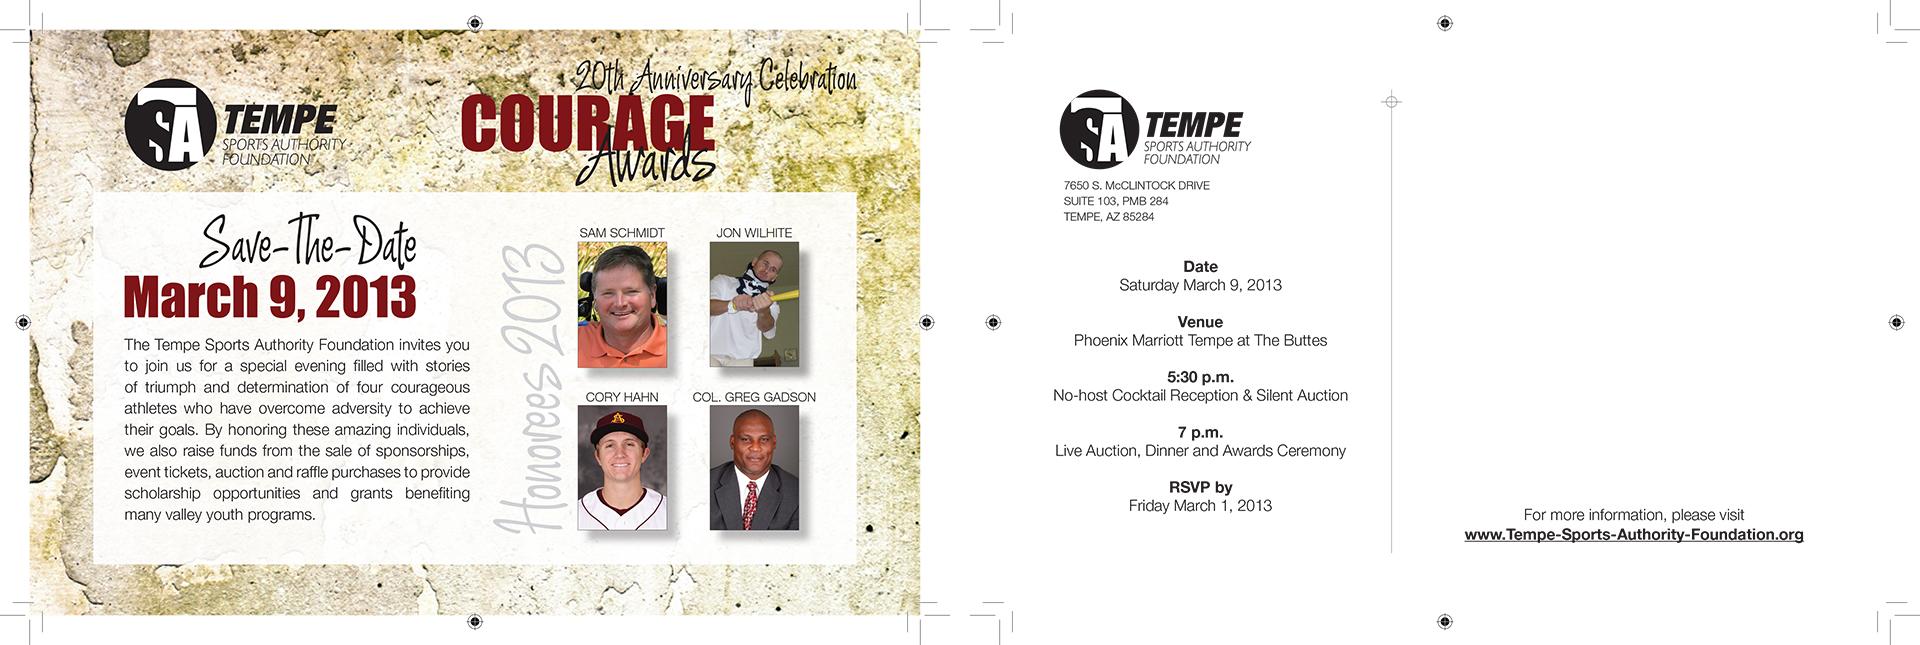 Tempe Sports Authority Foundation Invitation Design